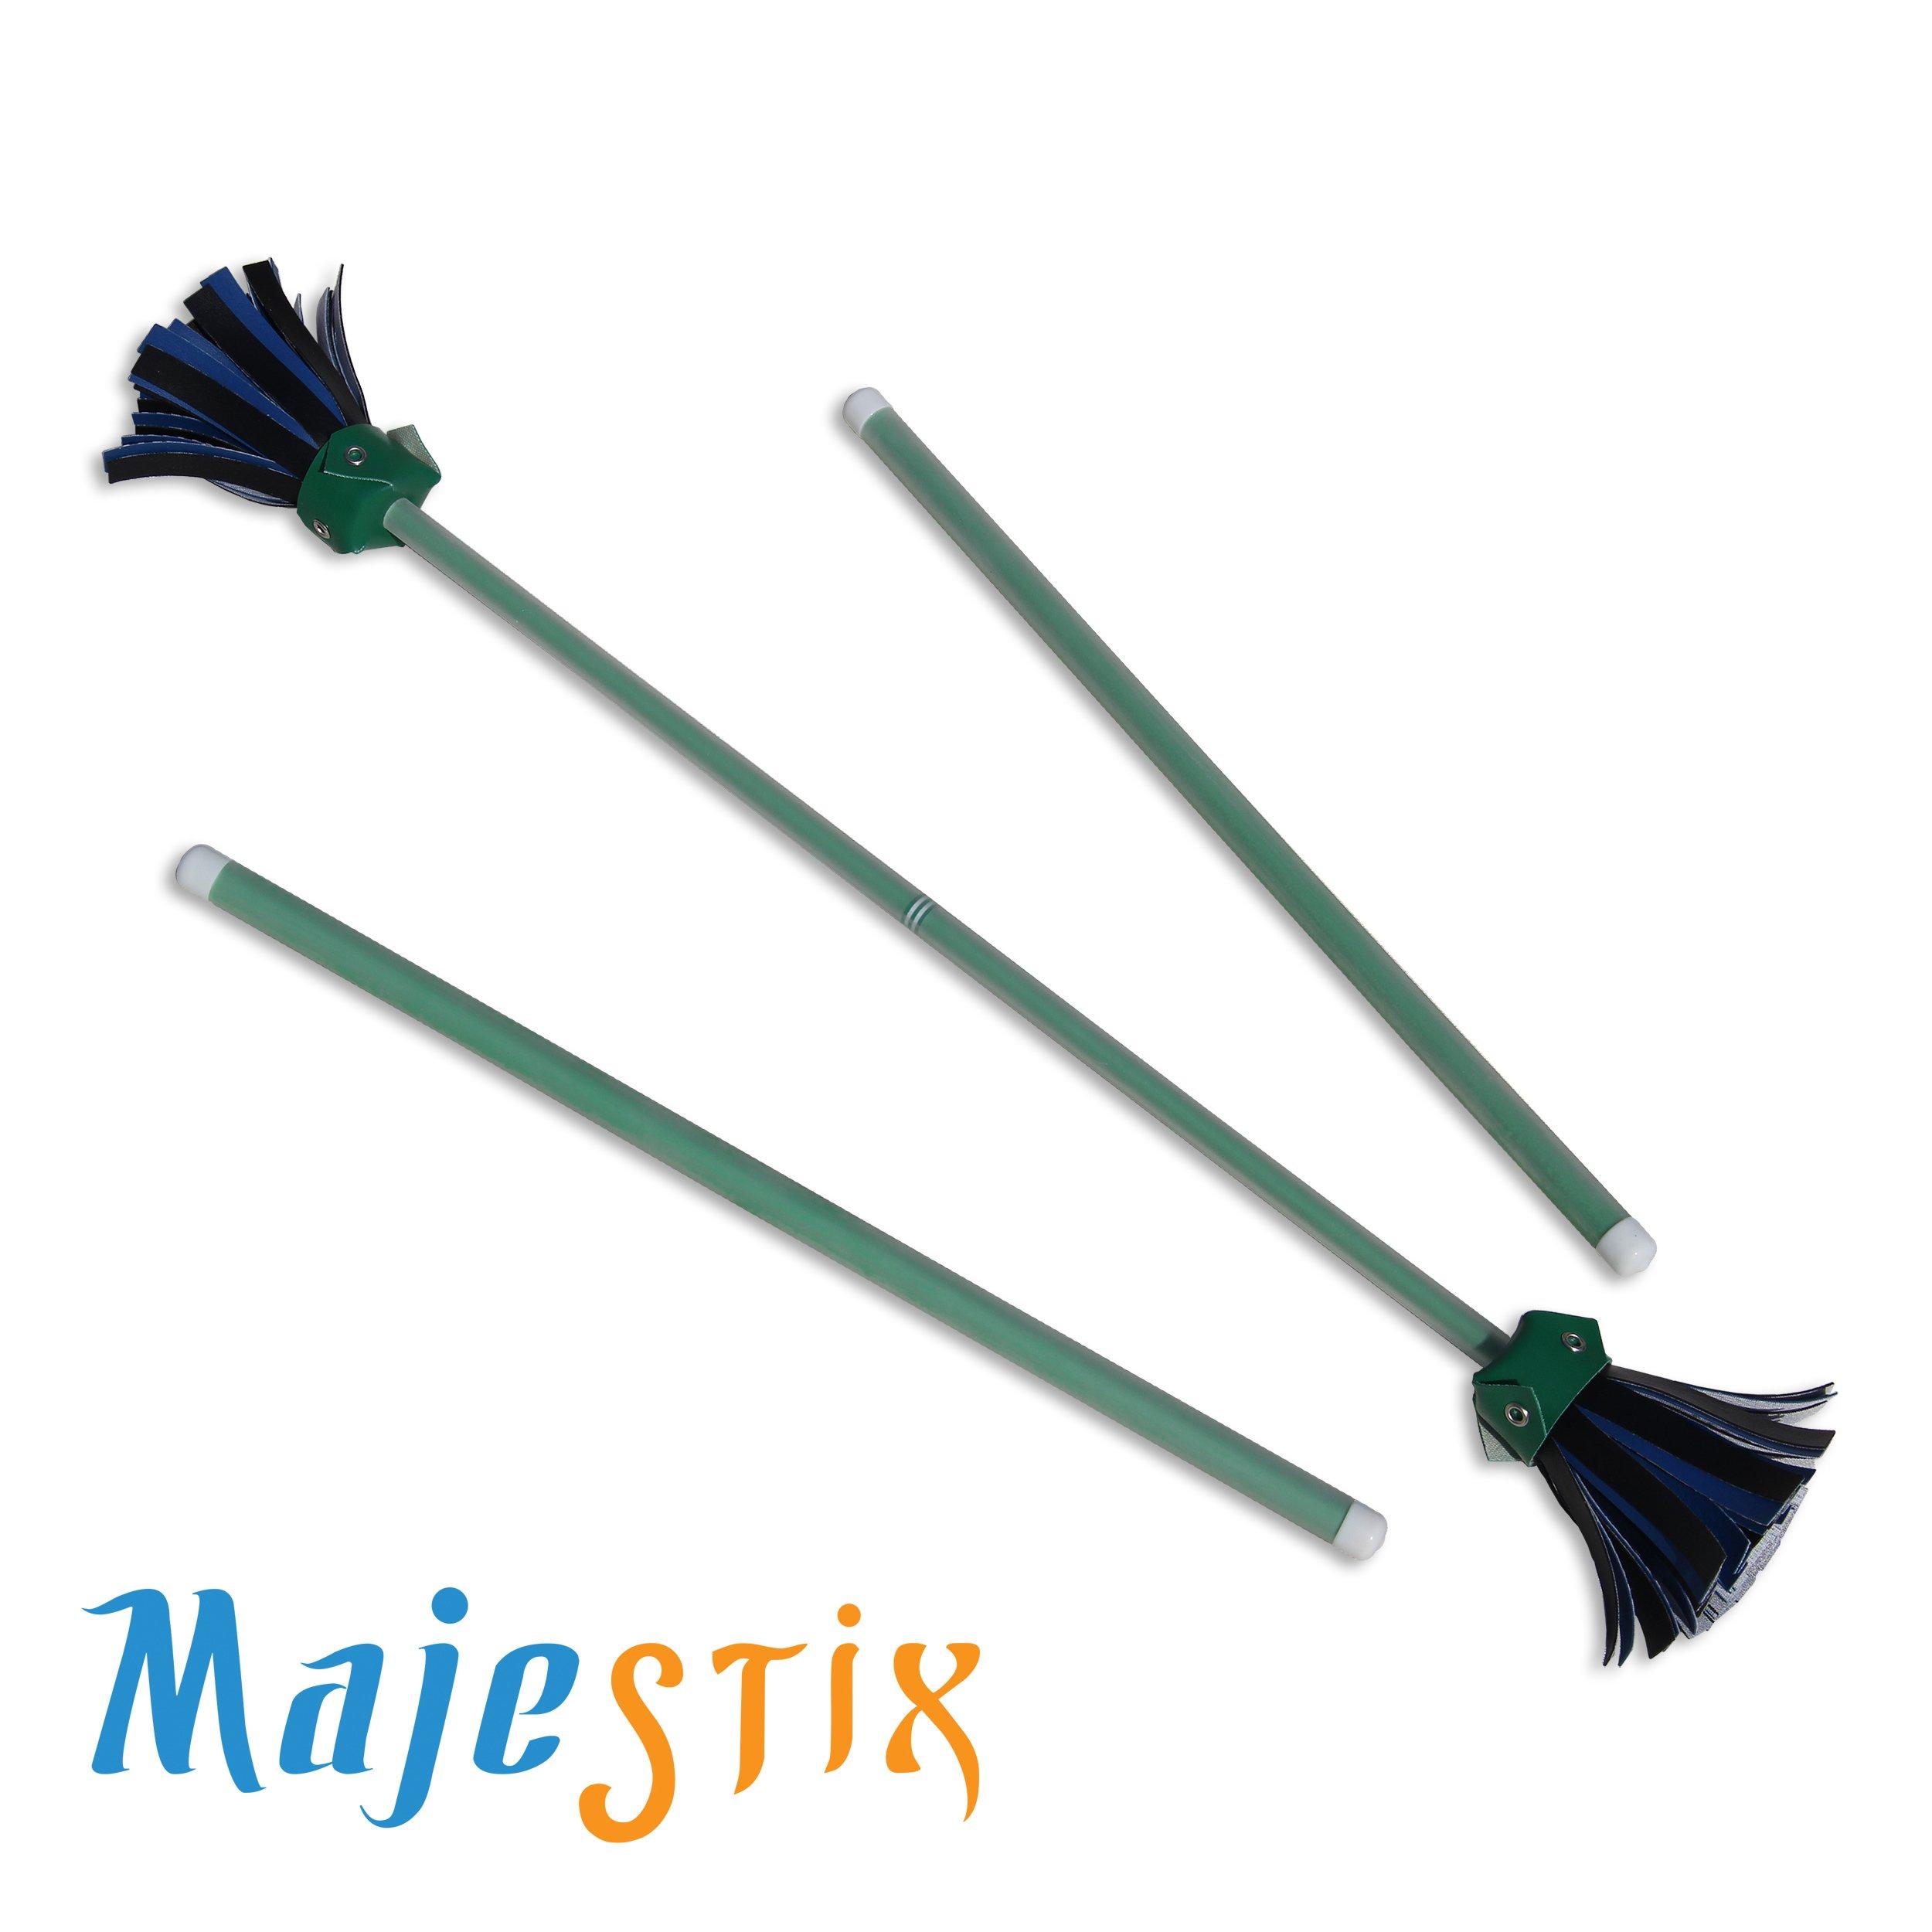 Green Majestix Juggling Sticks Devil Sticks by Jolly Lama! (Image #2)